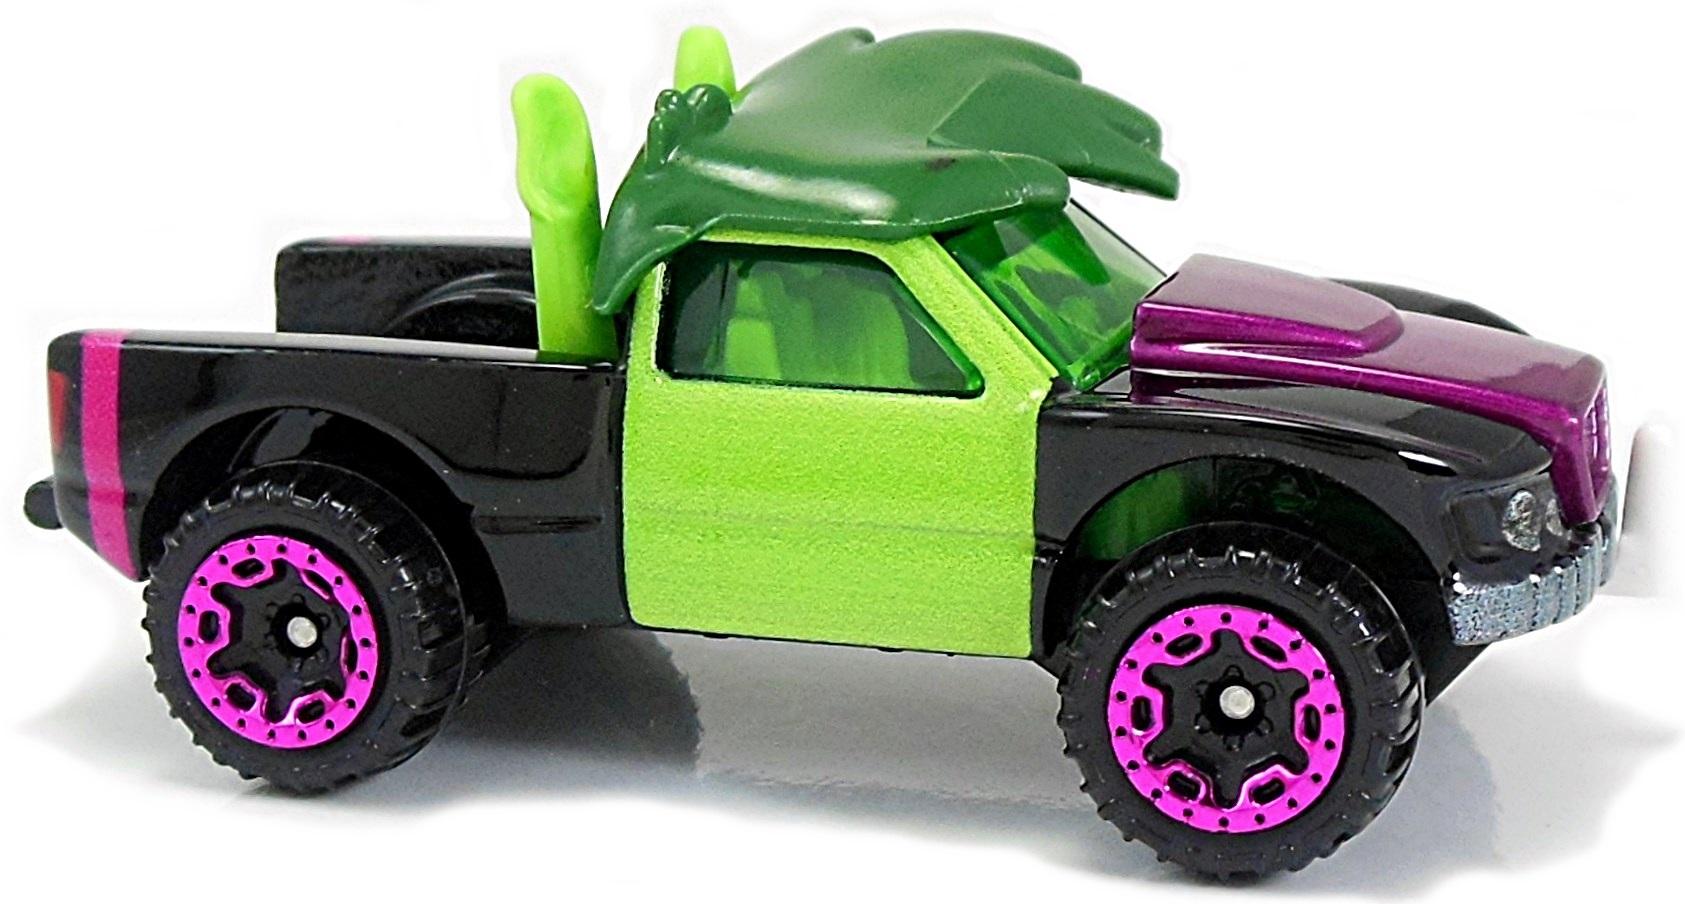 2018 Character Cars Teen Titans Go Dc  Hot Wheels Newsletter-6203